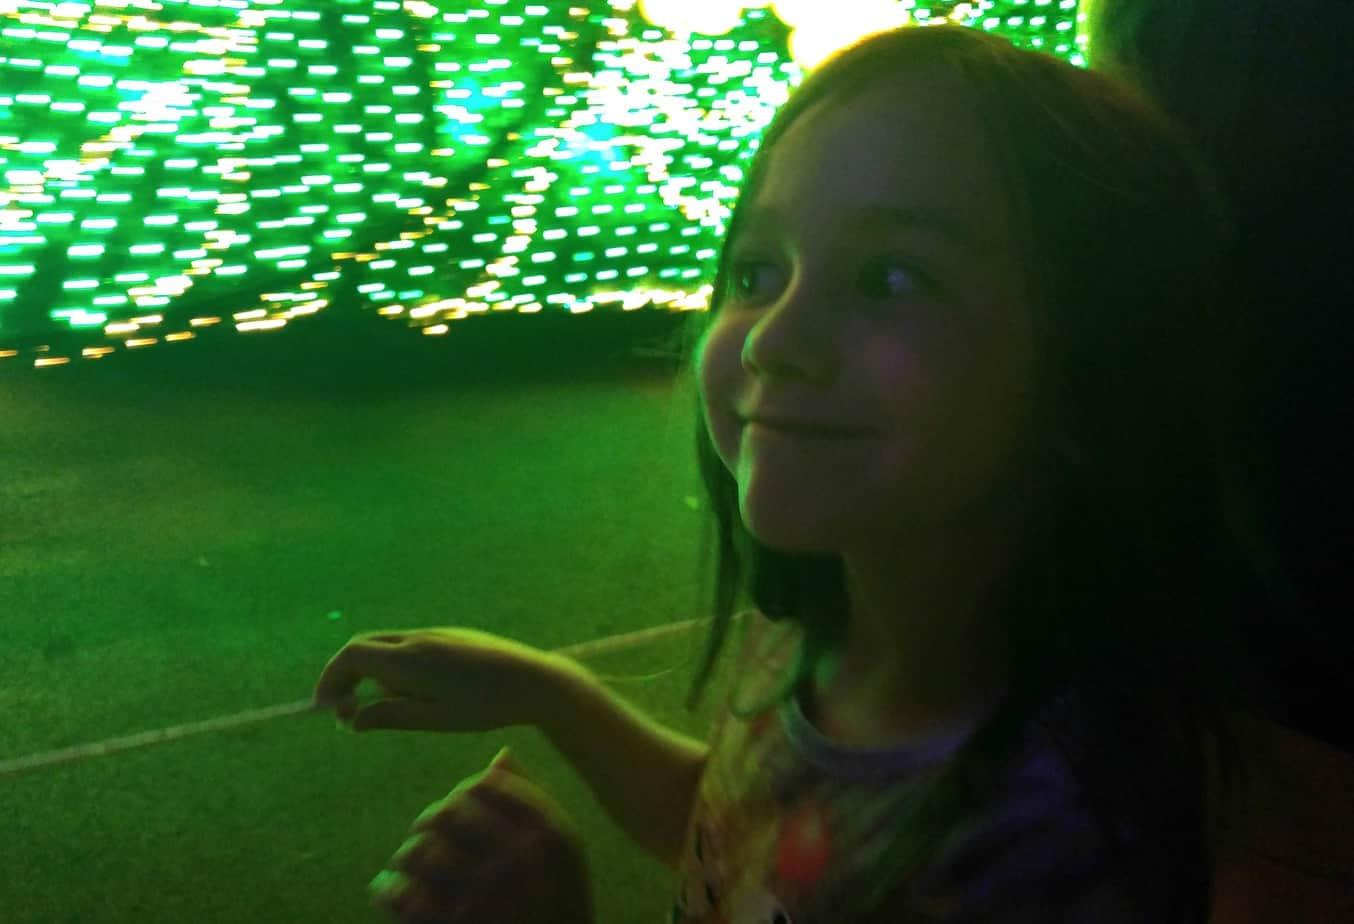 Light Show at Disney